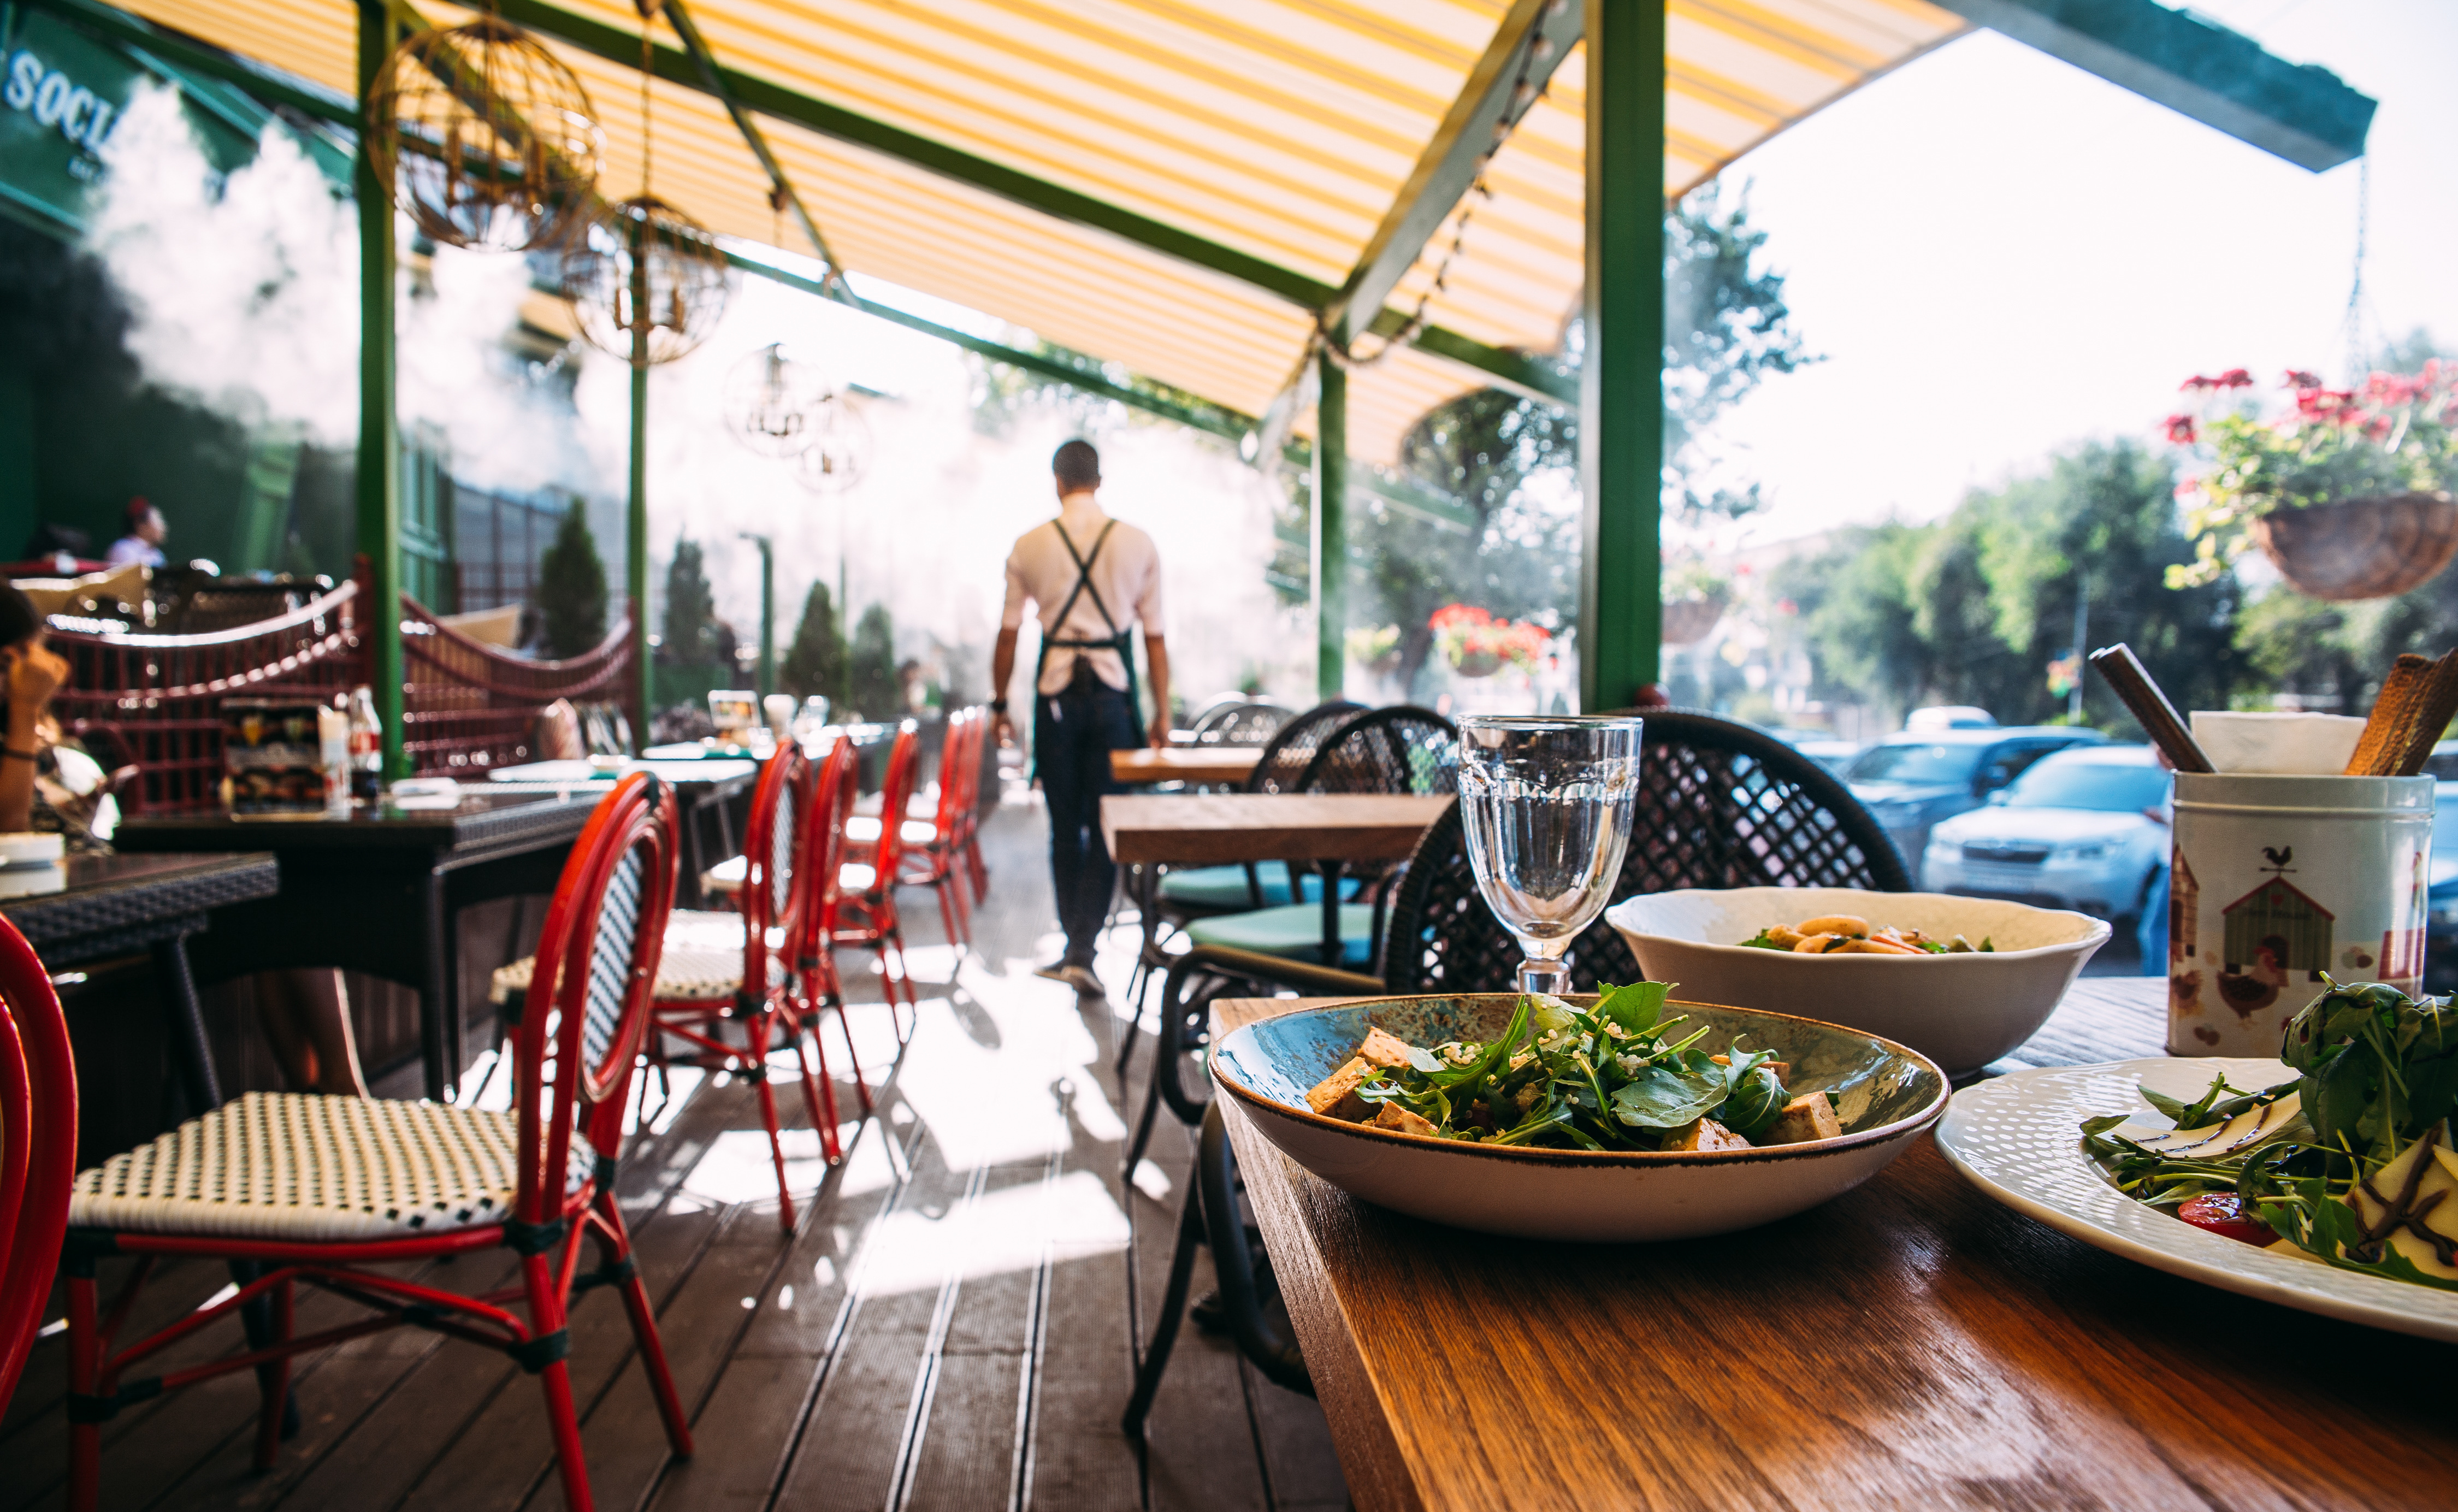 Ten Of The Best Restaurants In Richmond Va Live Free Creative Co